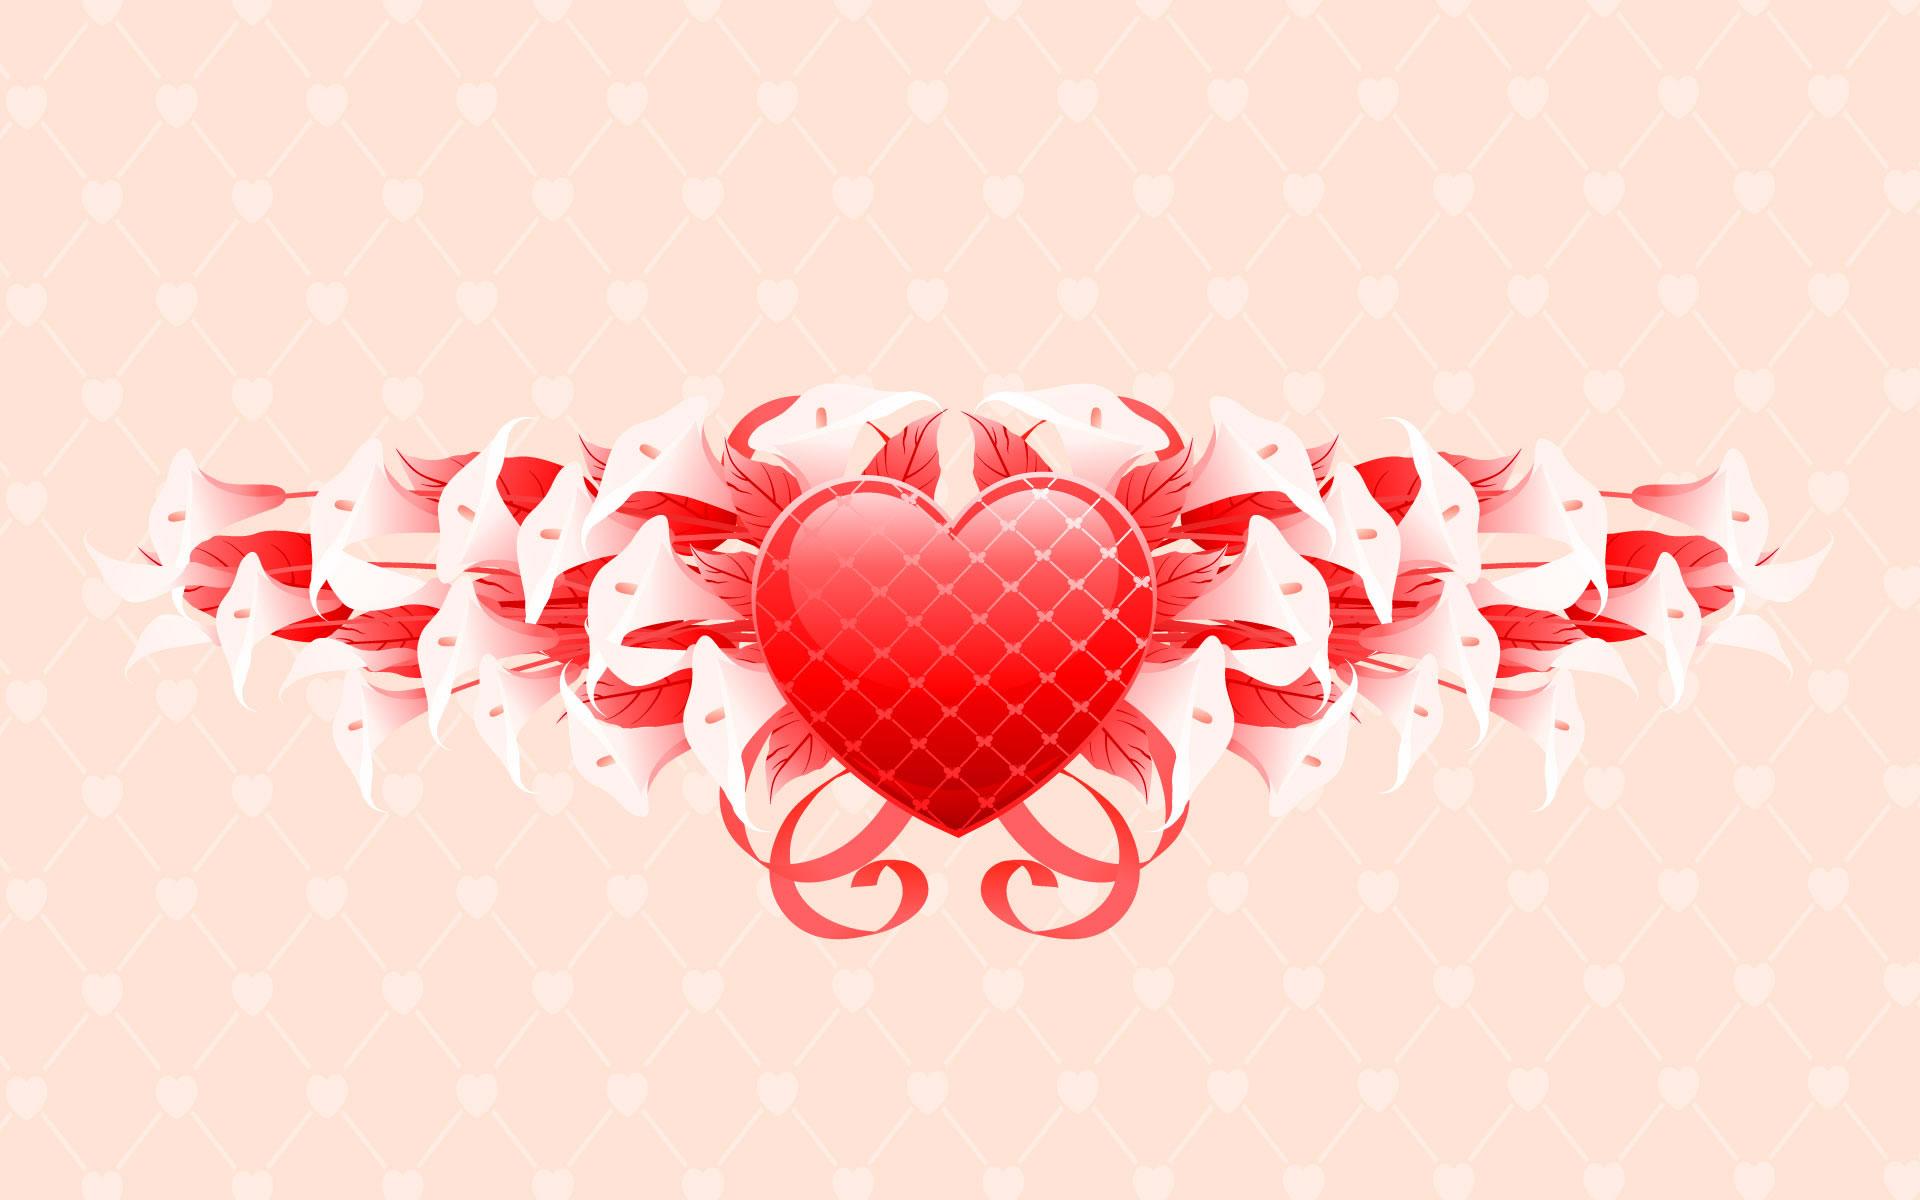 Fondos de San Valentín 2013